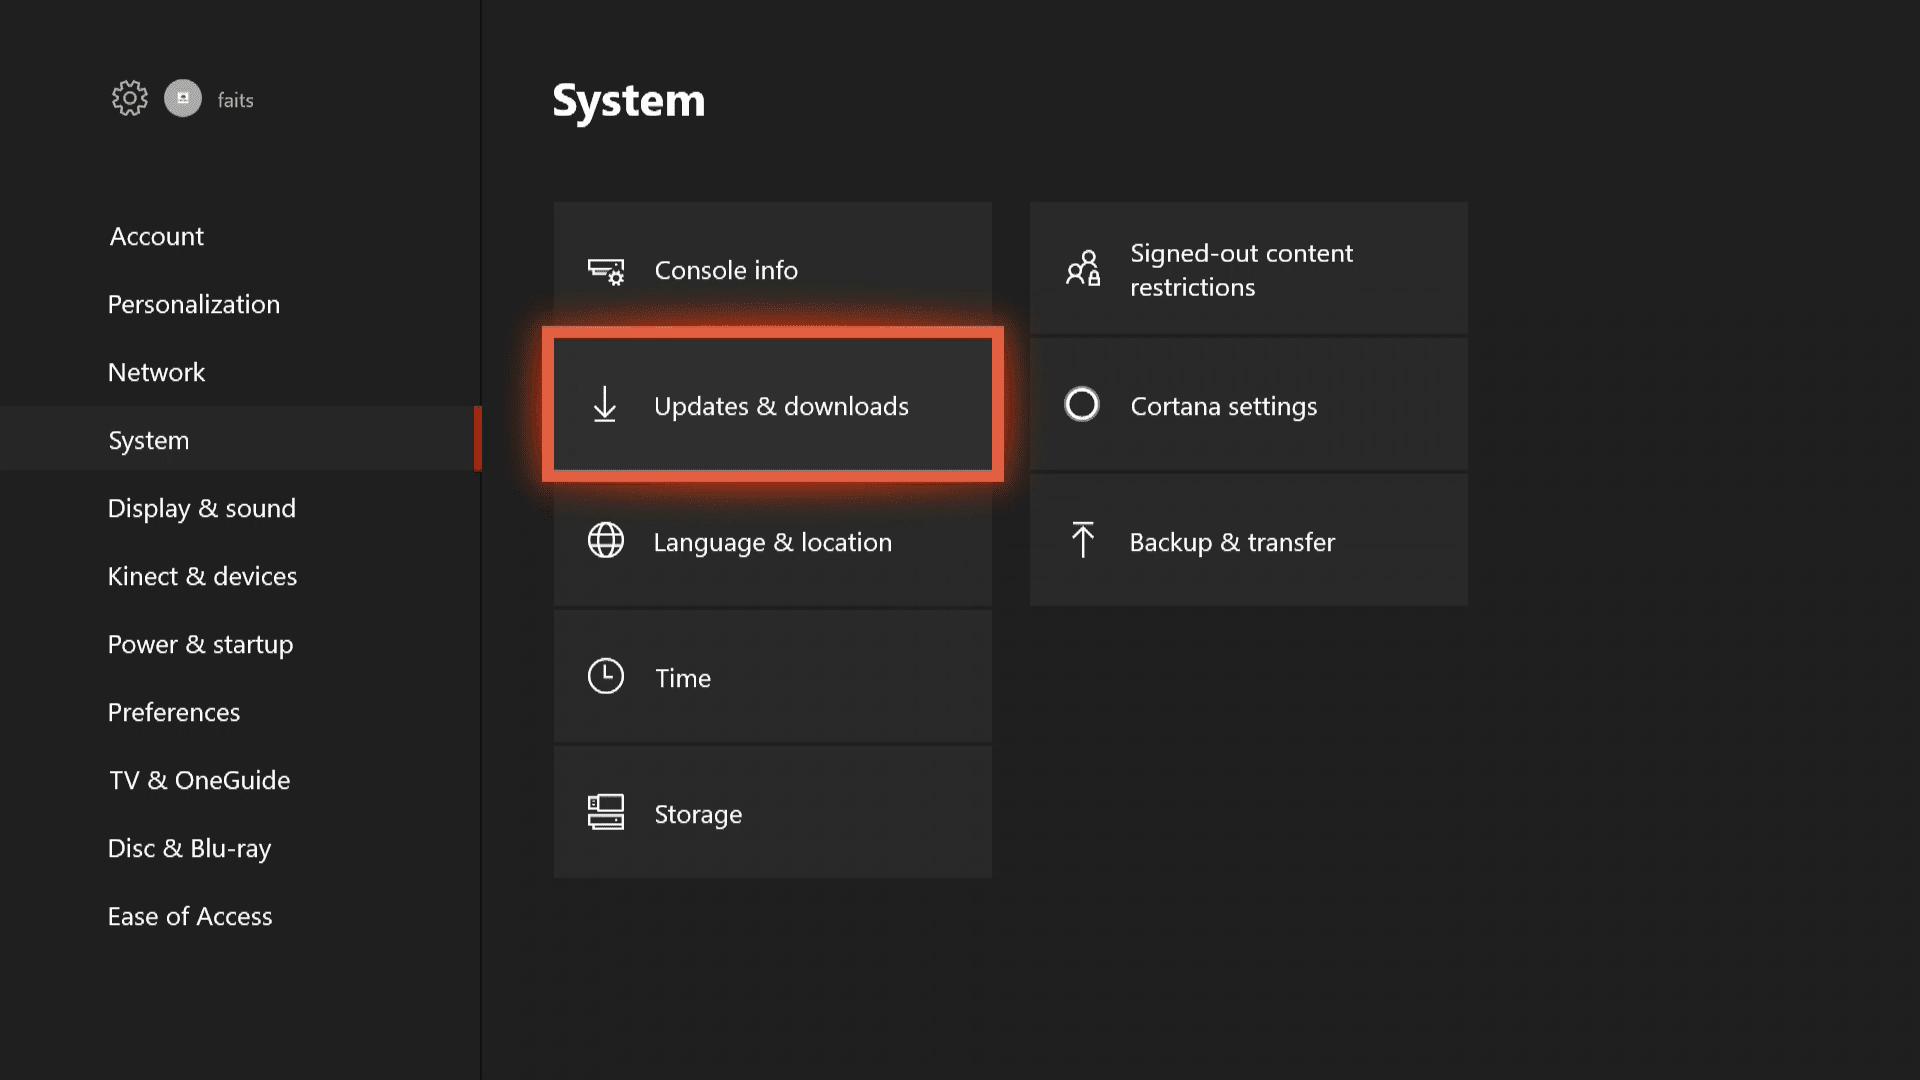 A screenshot of the Xbox One System menu.